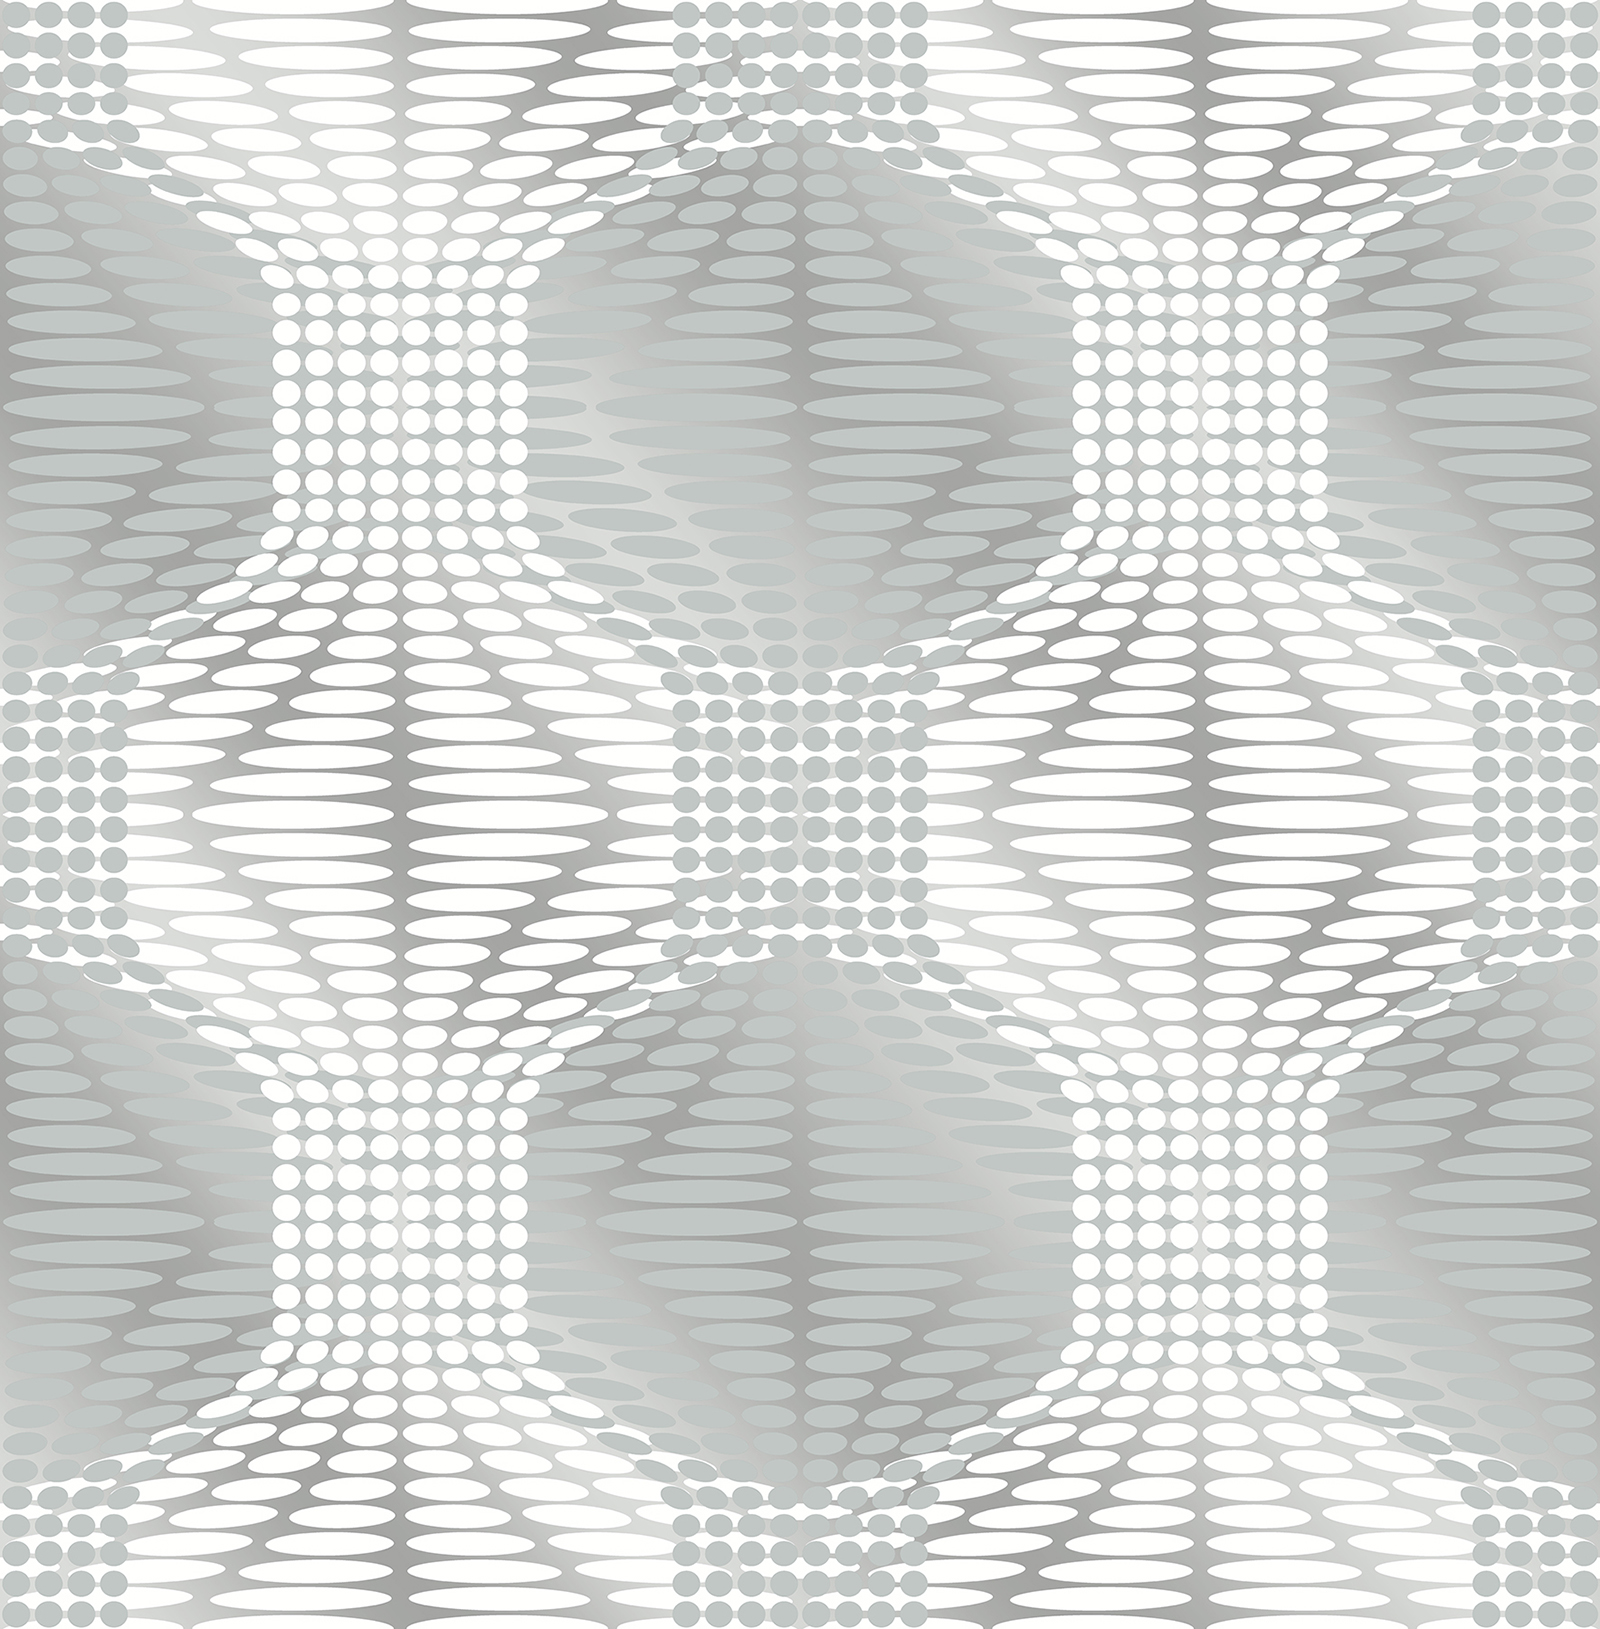 A-Street Prints Optic Blue Geometric Wallpaper PartNumber: 00952274000P KsnValue: 7400524 MfgPartNumber: 2697-22629